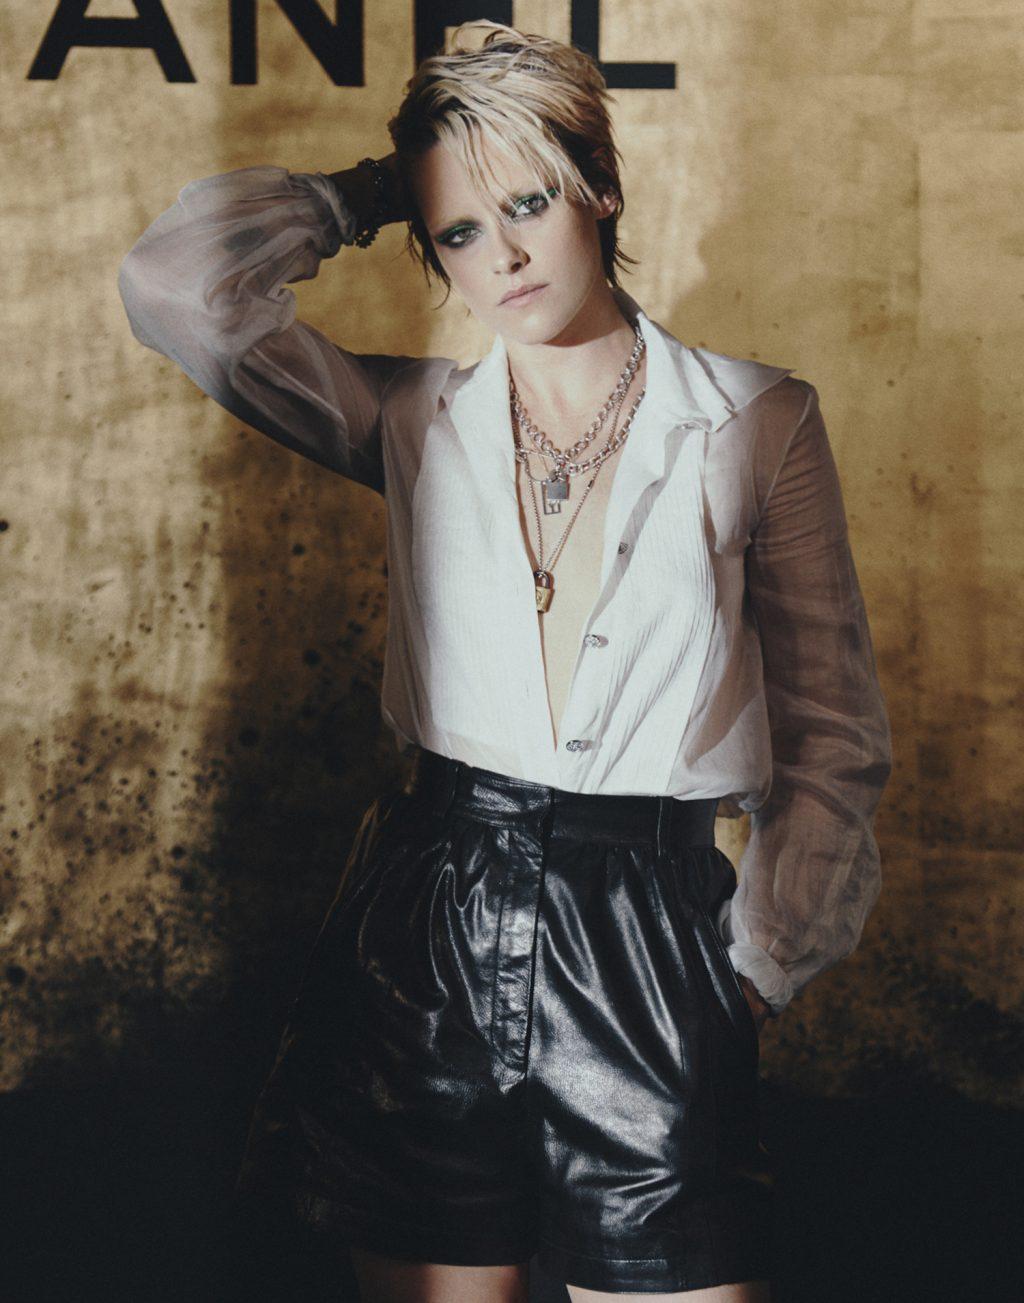 Kristen Stewart mặc áo blouse trắng quần da đen tại buổi trình diễn bst métiers d'art của Chanel